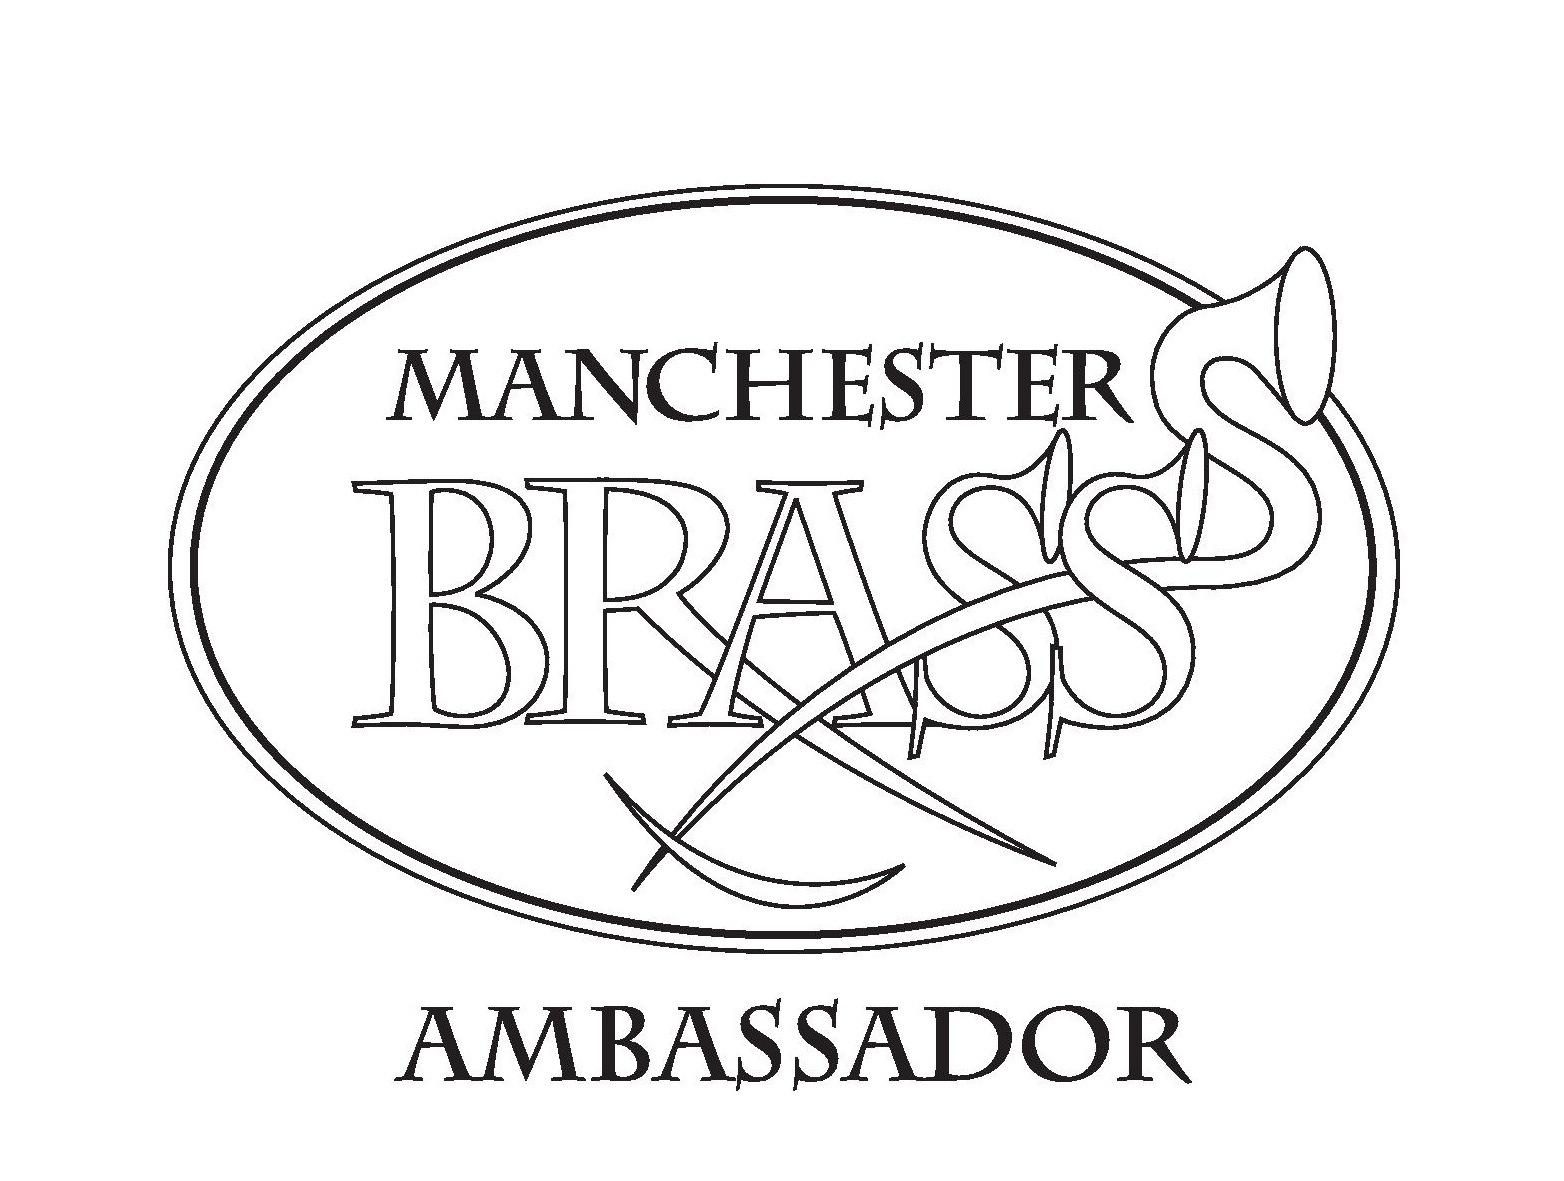 mb-ambassador-logo.jpg